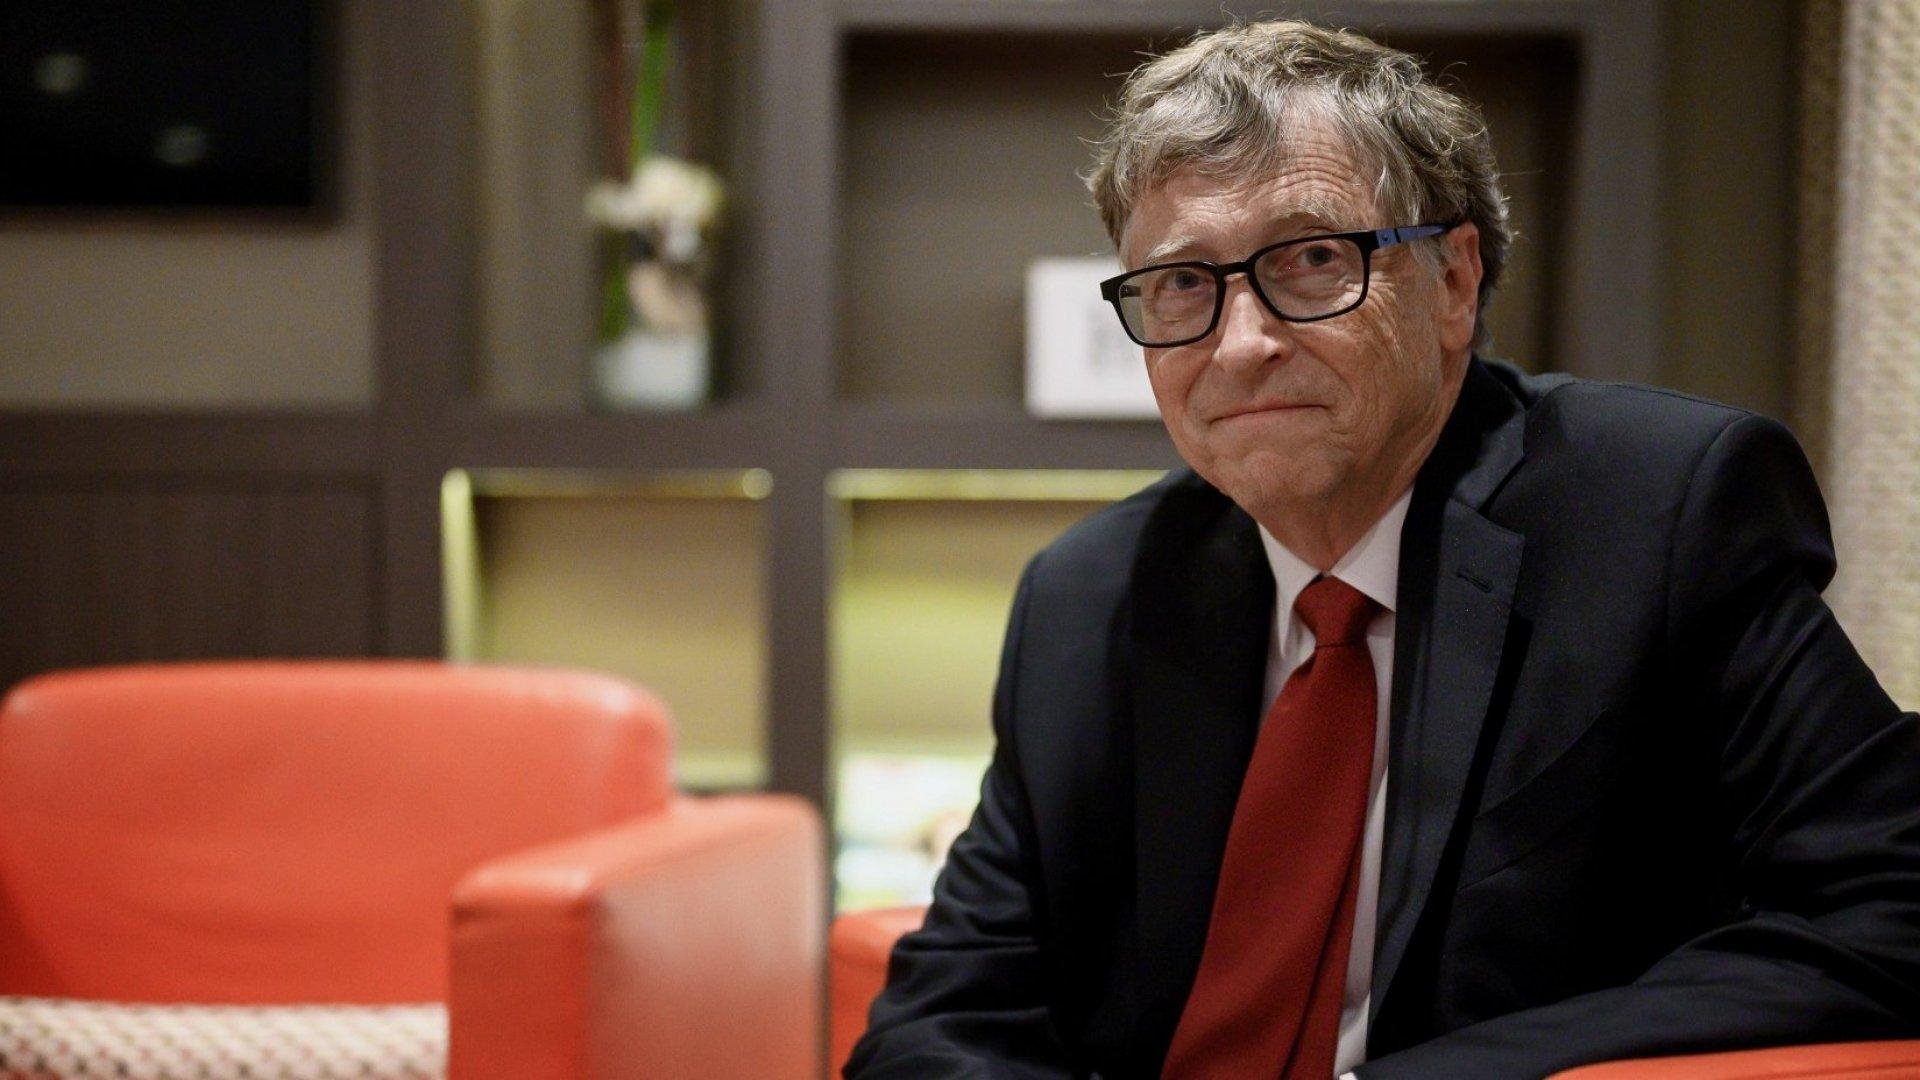 Bill Gates Is Leaving Microsoft's Board to Focus on Philanthropic Efforts